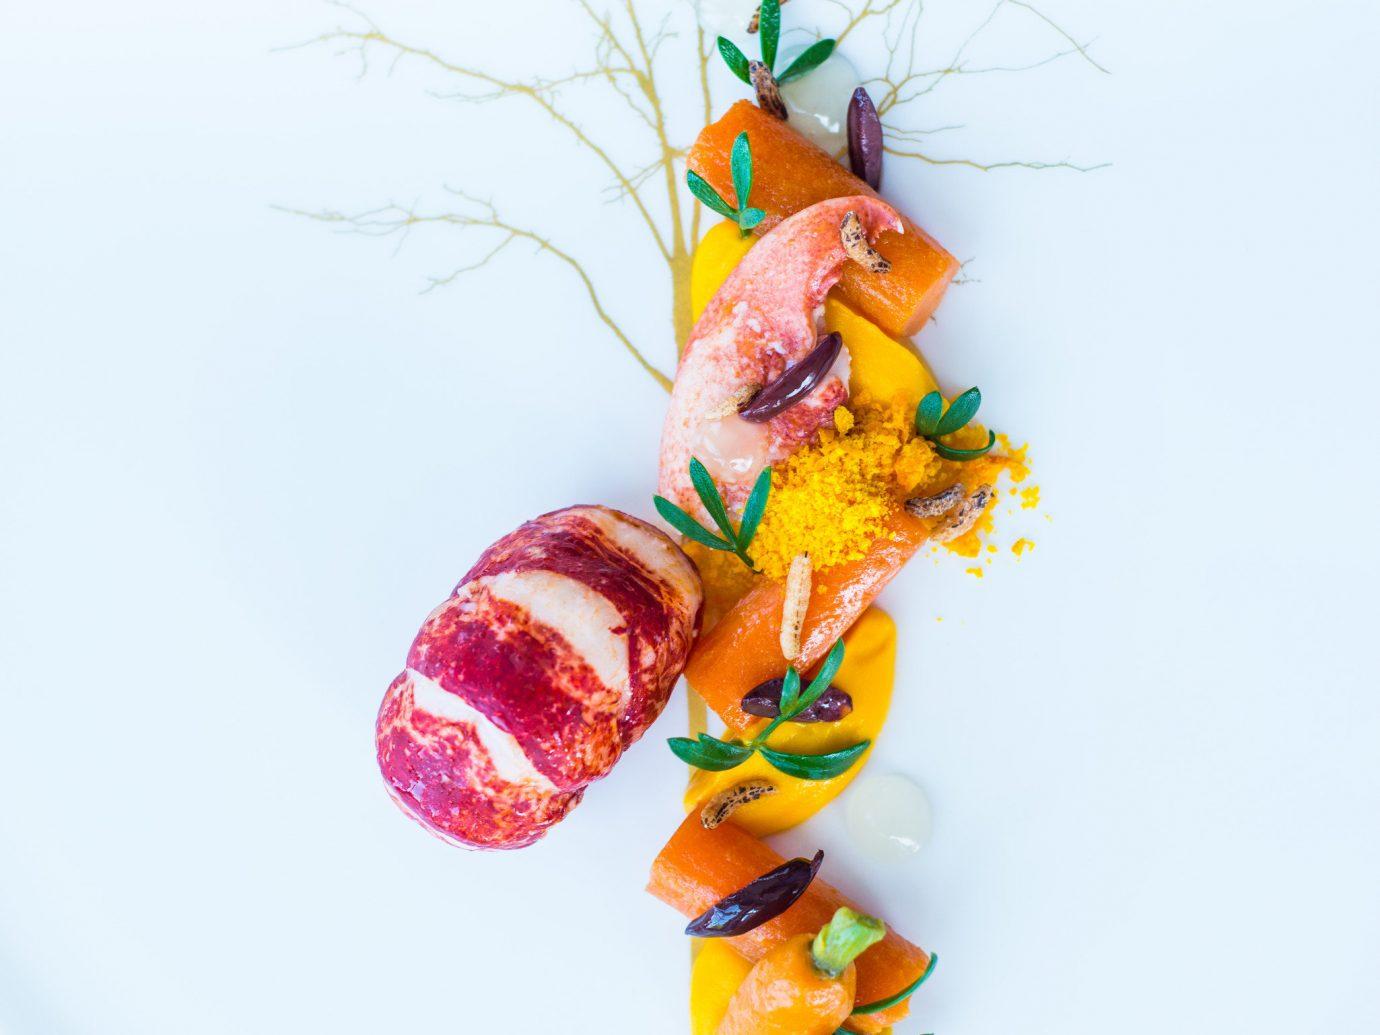 England europe London Luxury Travel Romantic Hotels plate art food dish colorful arranged